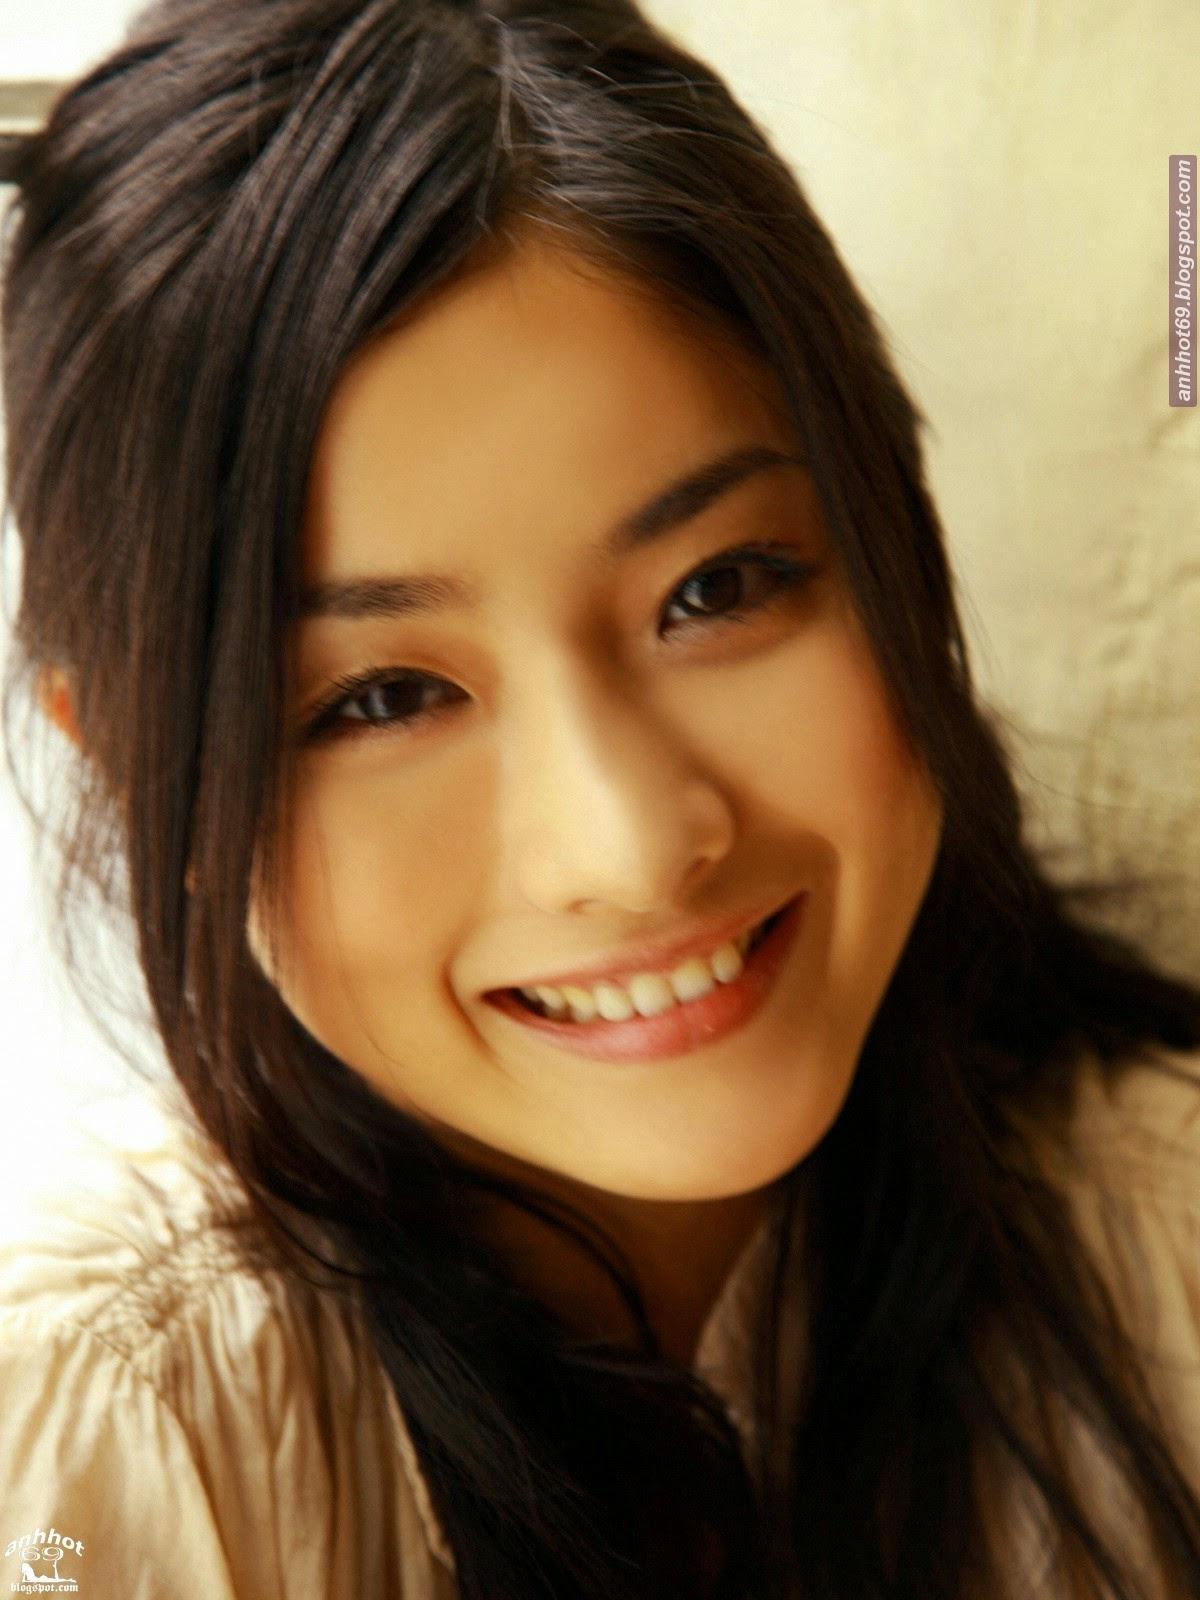 satomi-ishihara-00503955